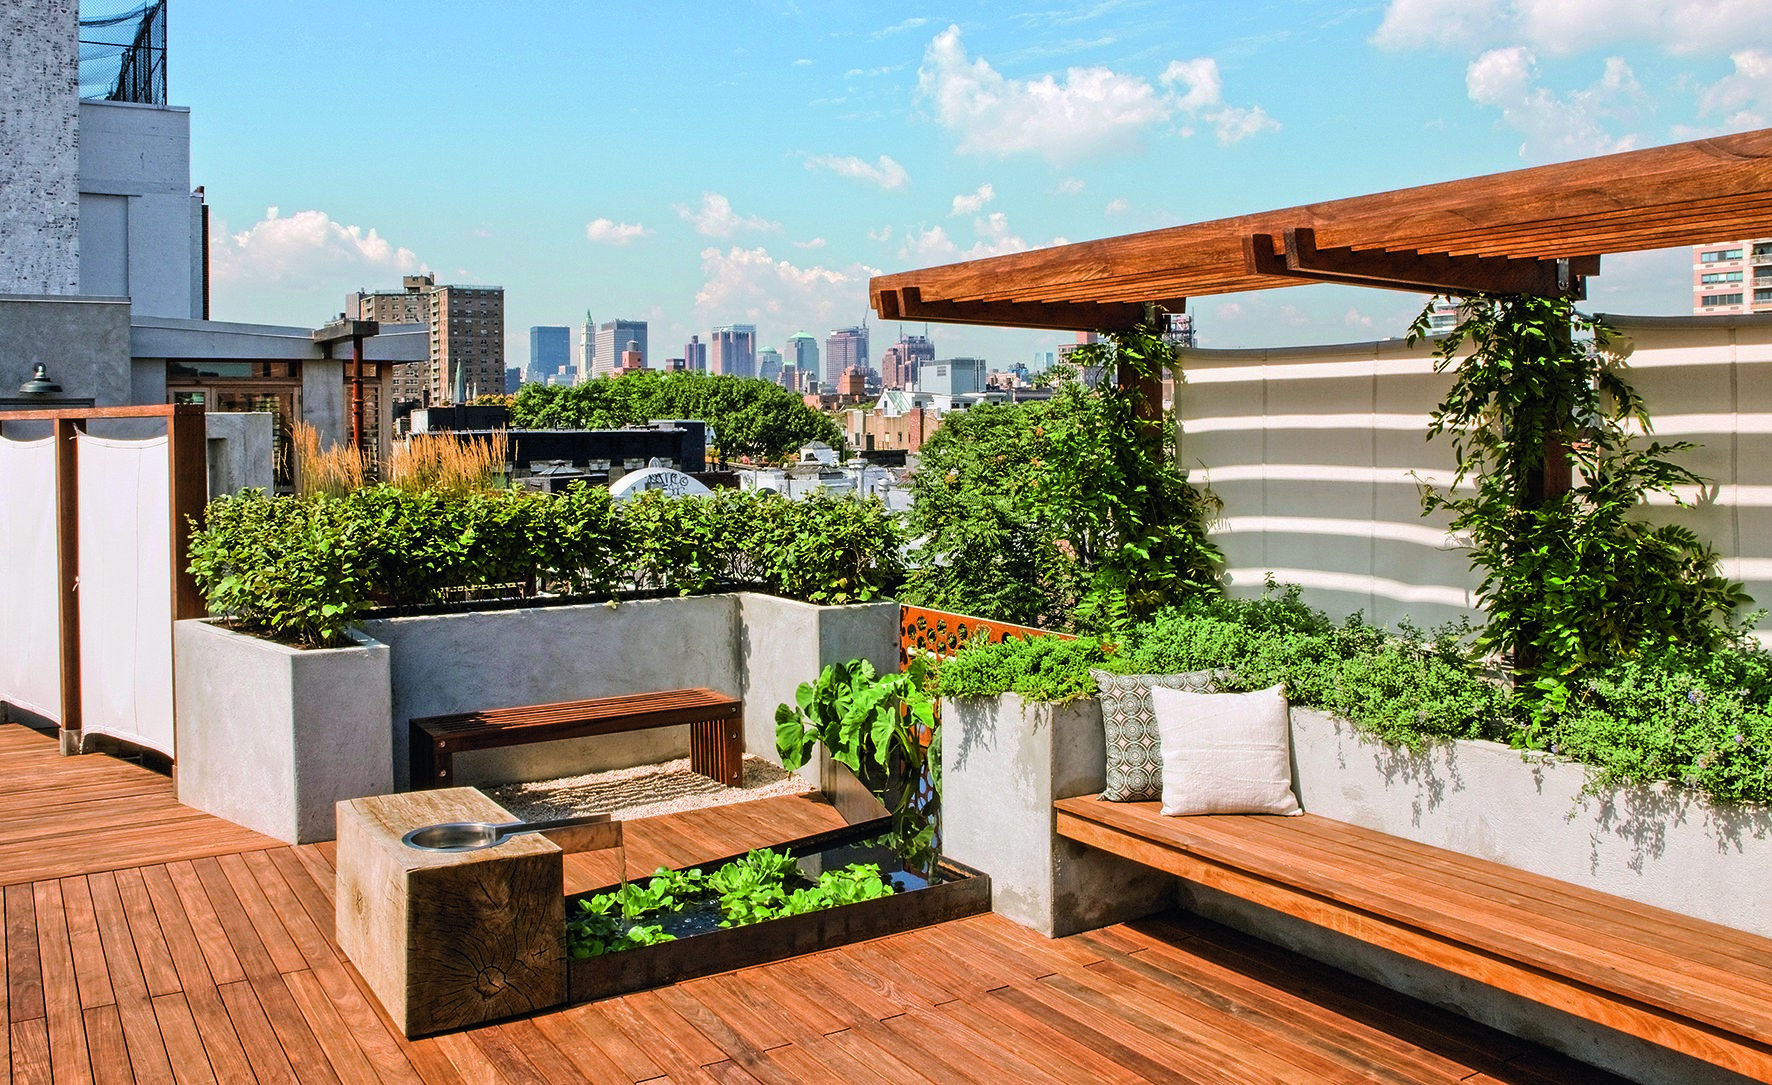 roof garden design 9 remarkable rooftop garden designs around the world photos | architectural LDRPJQT